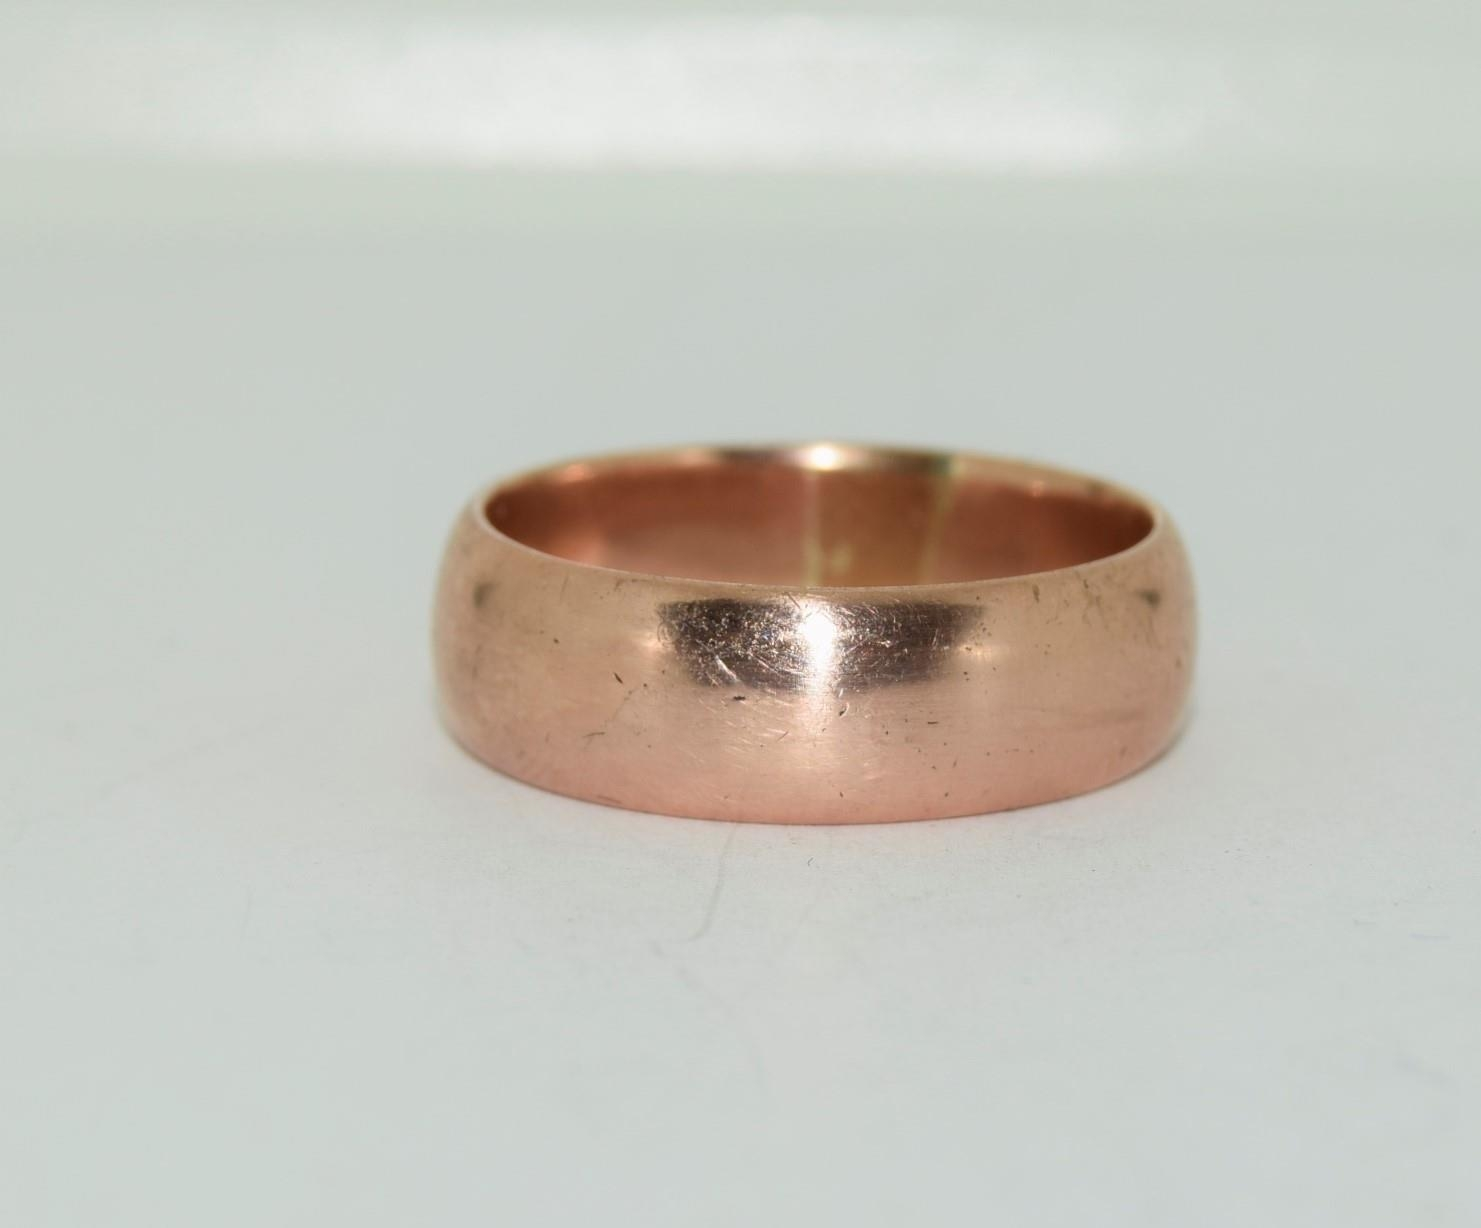 9ct gold mans wedding band size X 8.7gm